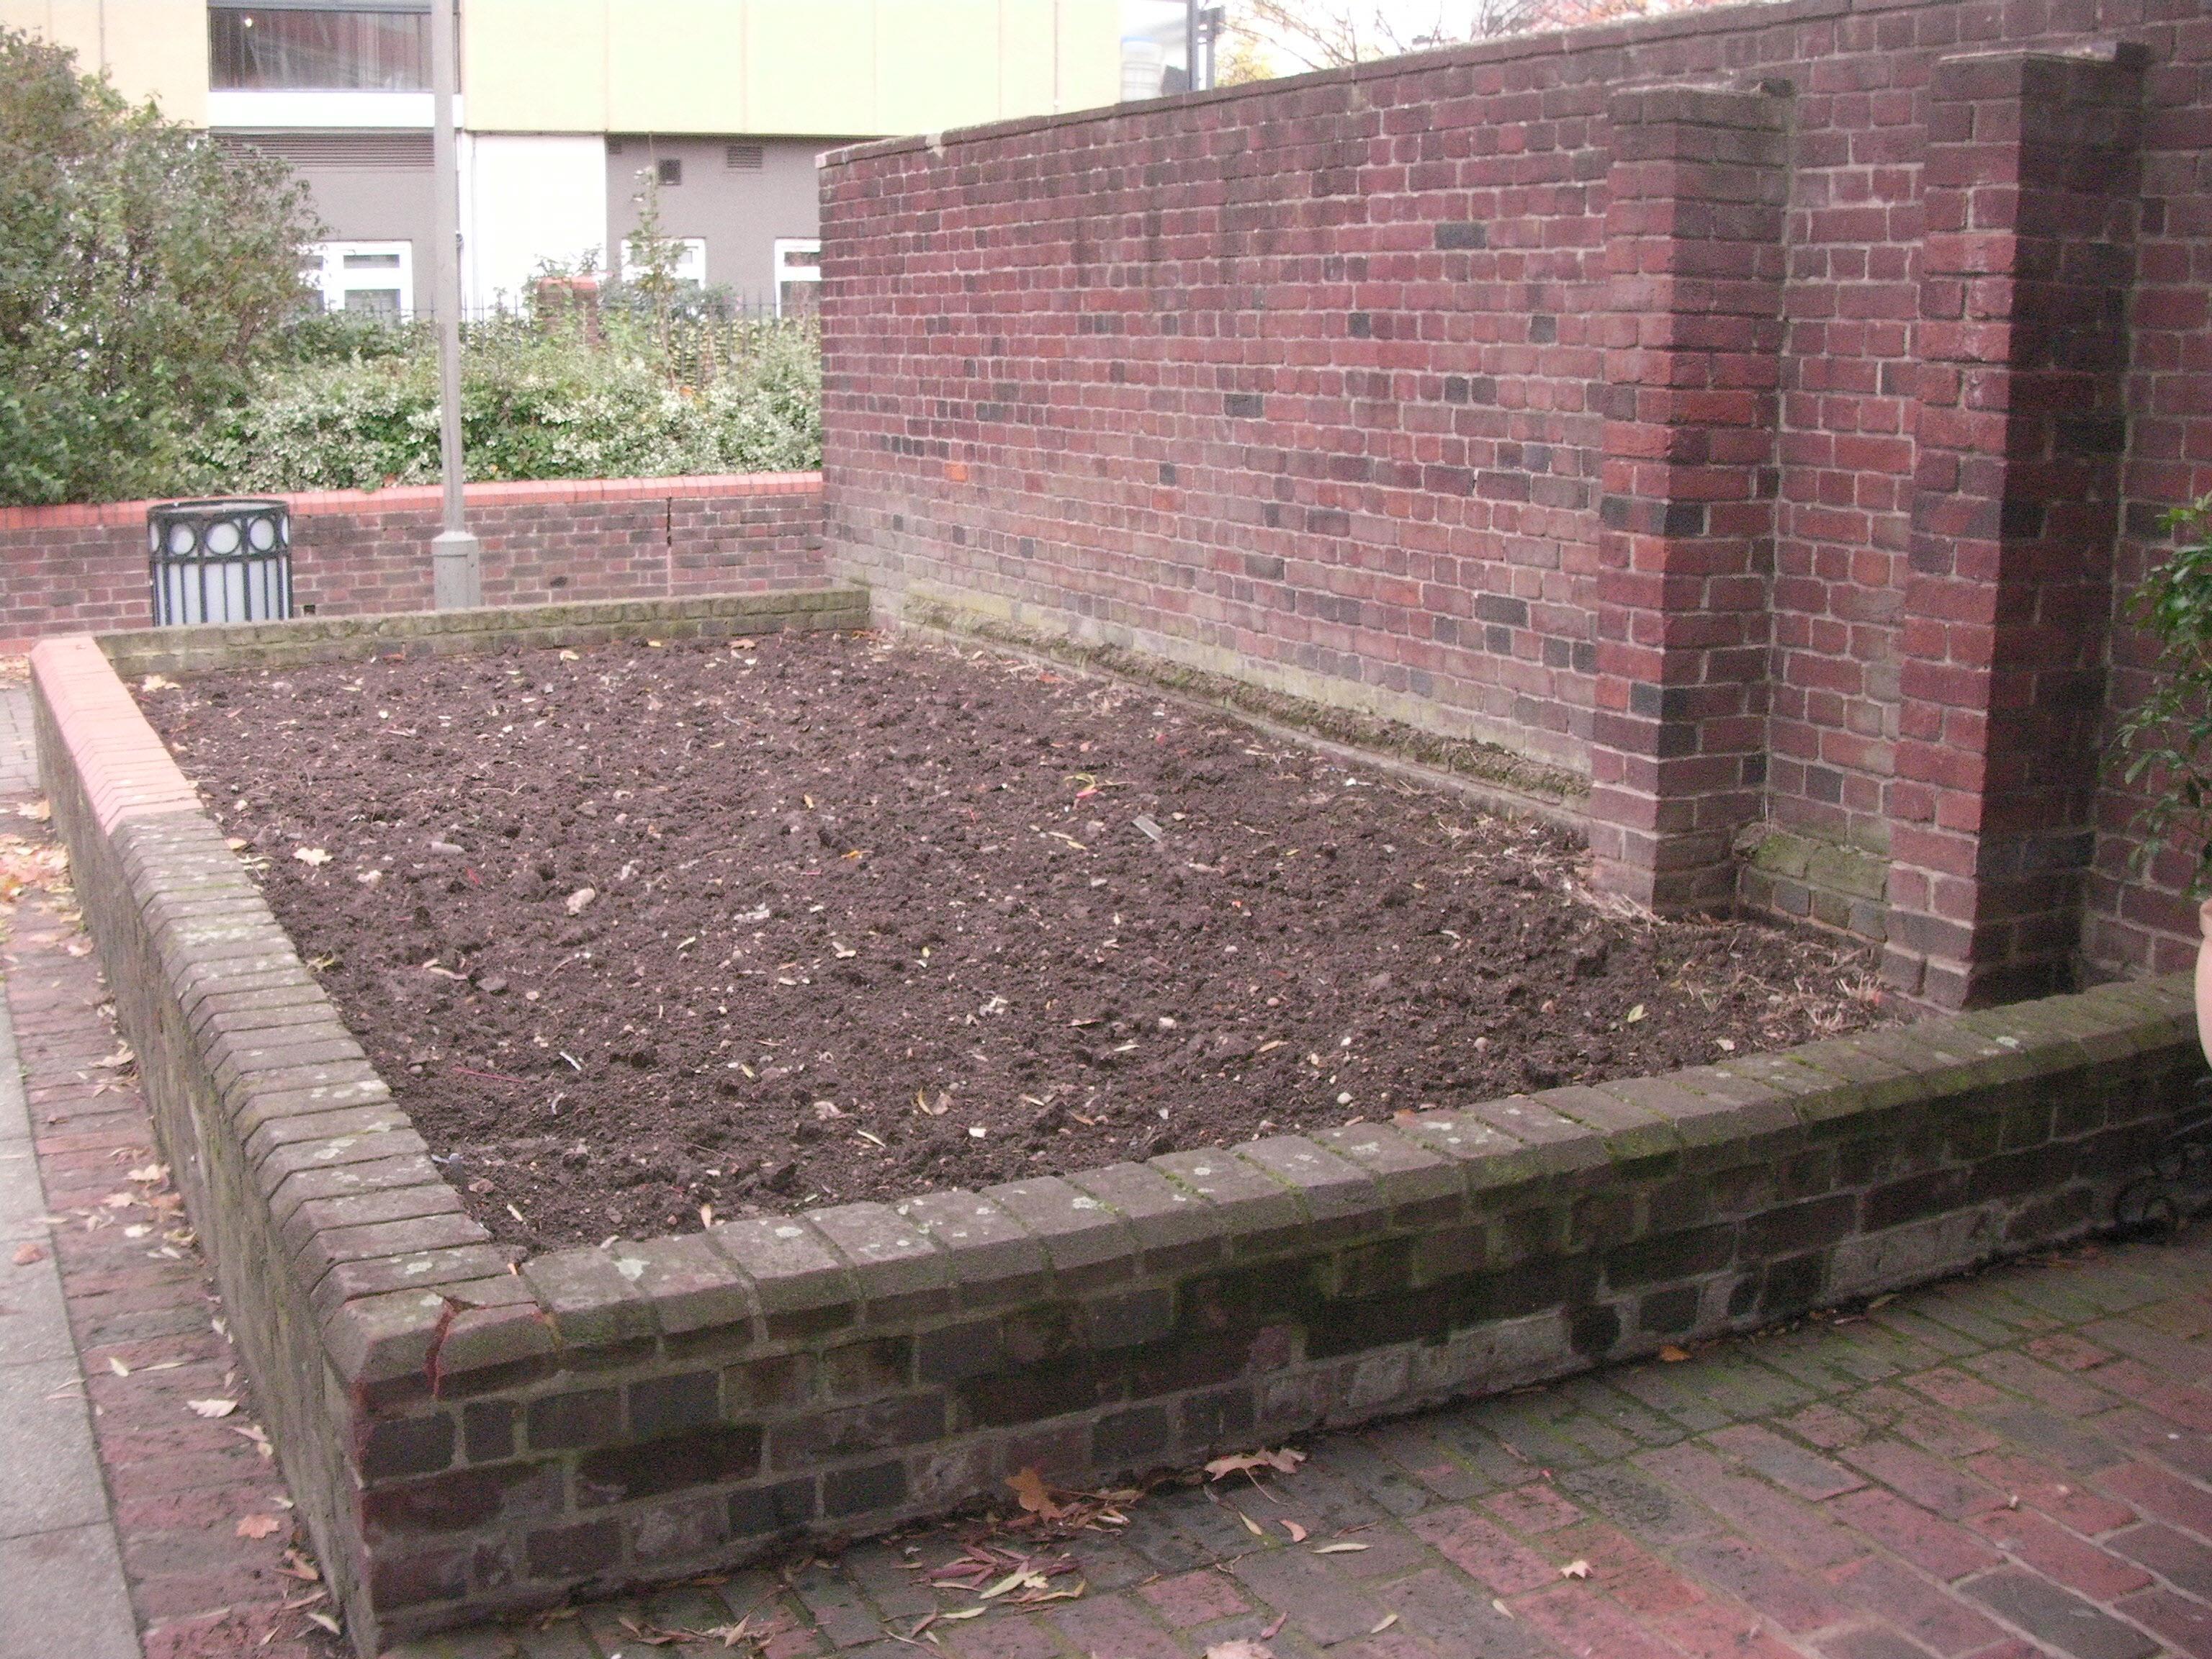 Herb Garden planting area